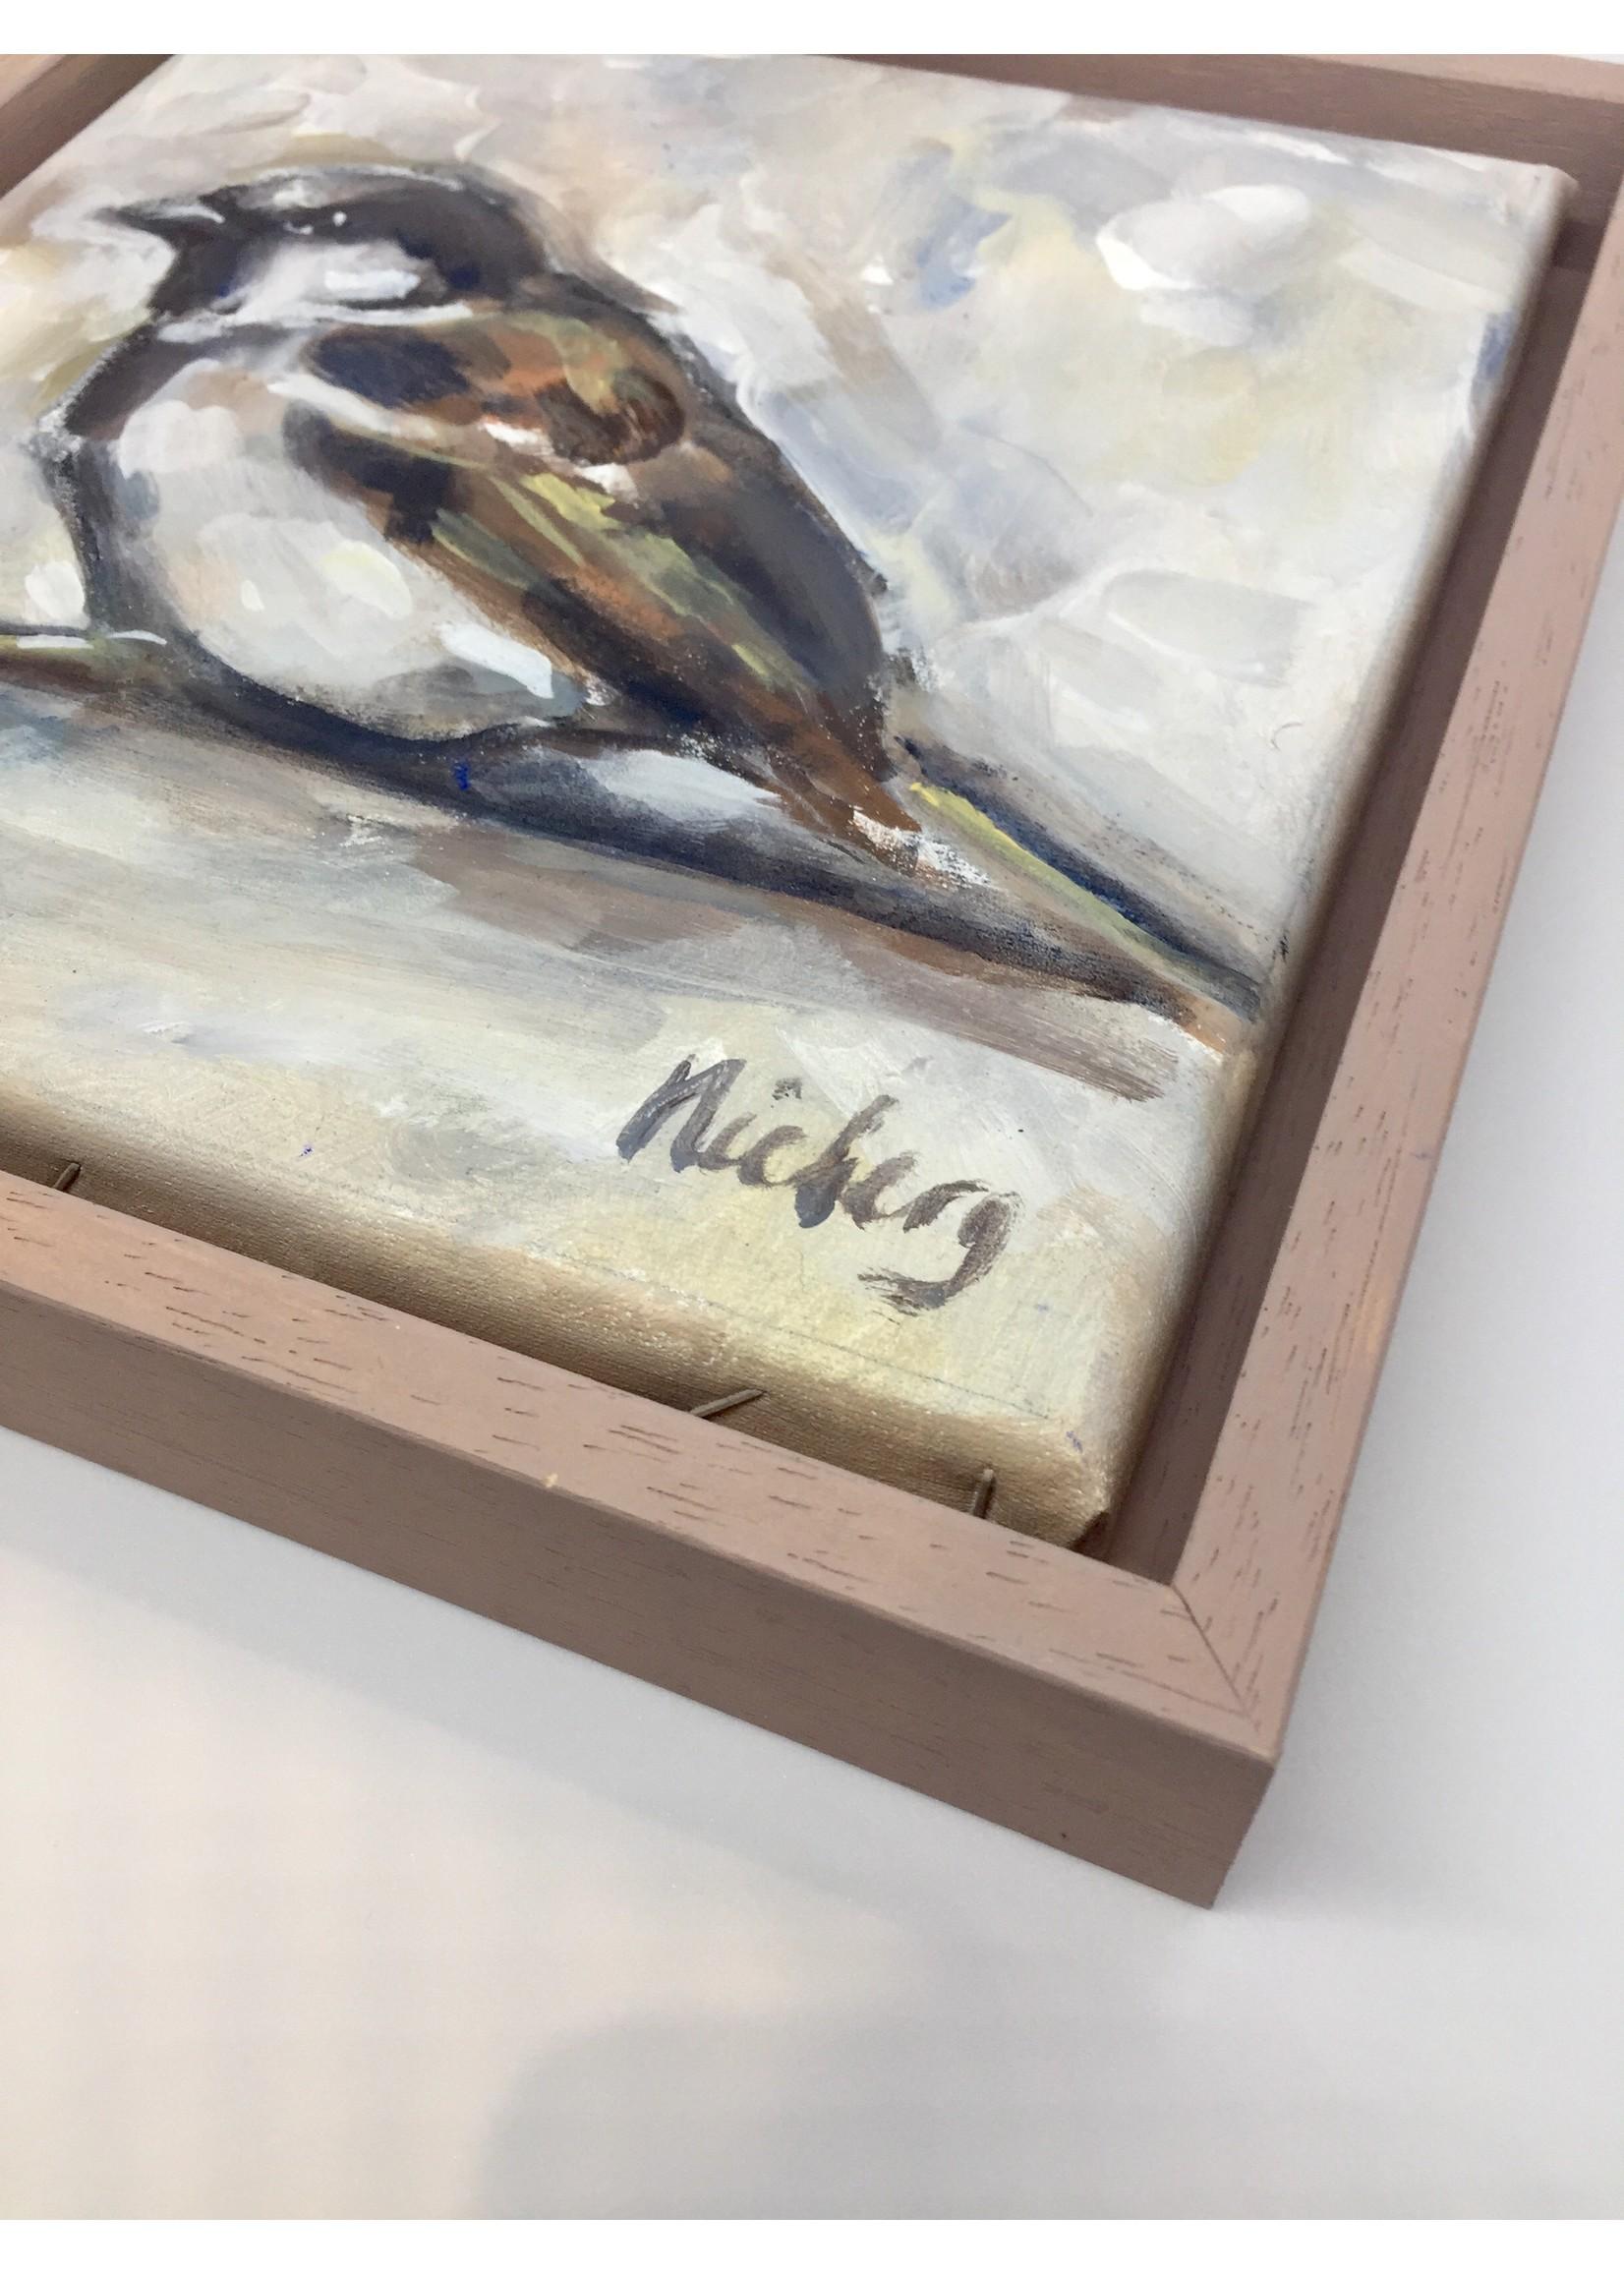 'Mus' - Monique Nieberg  (Acrylic on canvas)